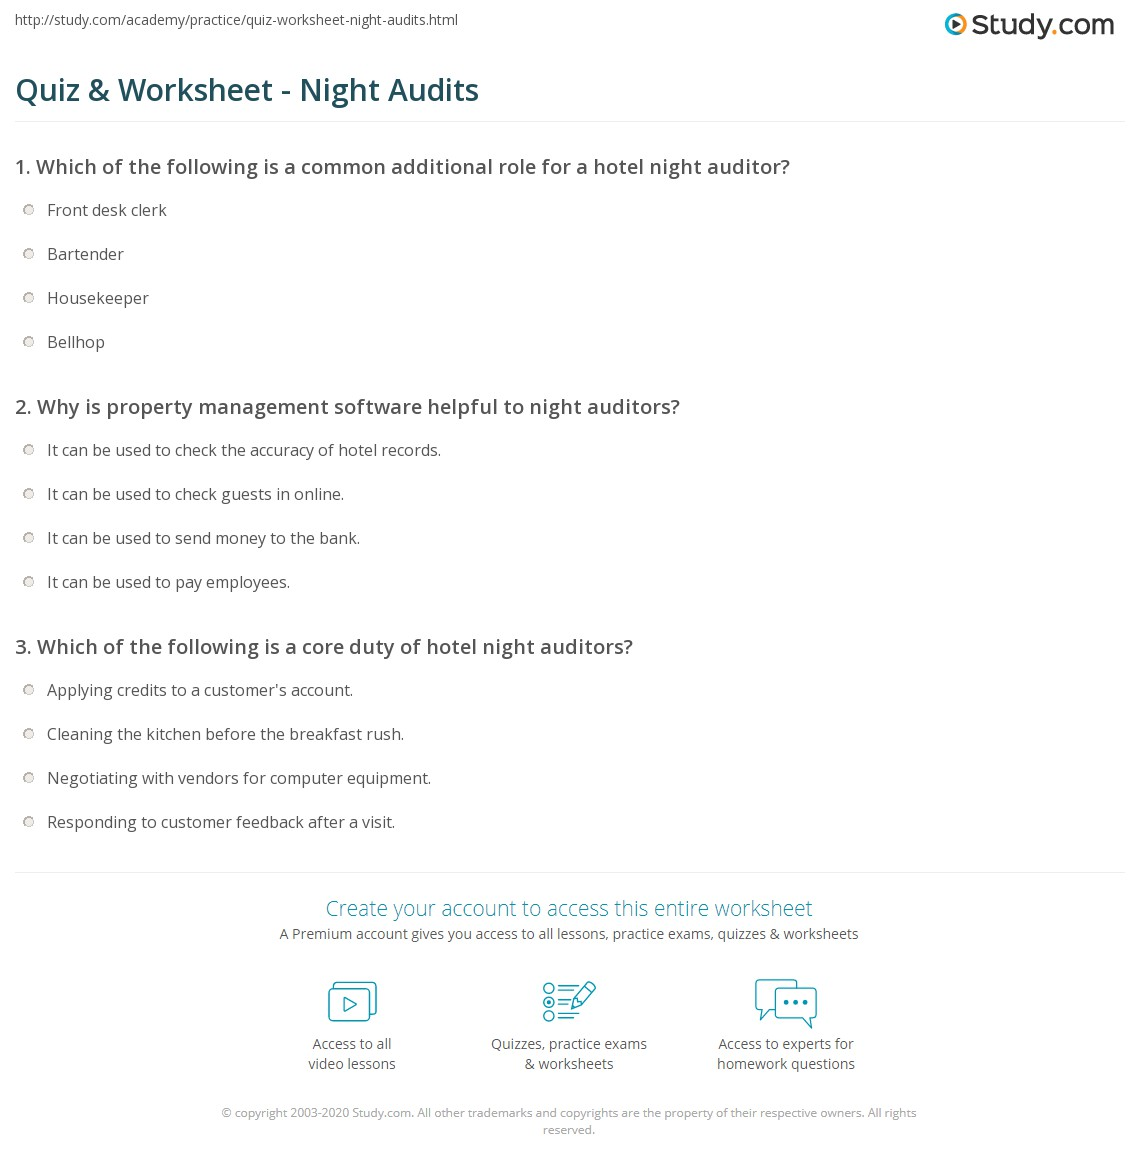 Quiz & Worksheet - Night Audits | Study.com